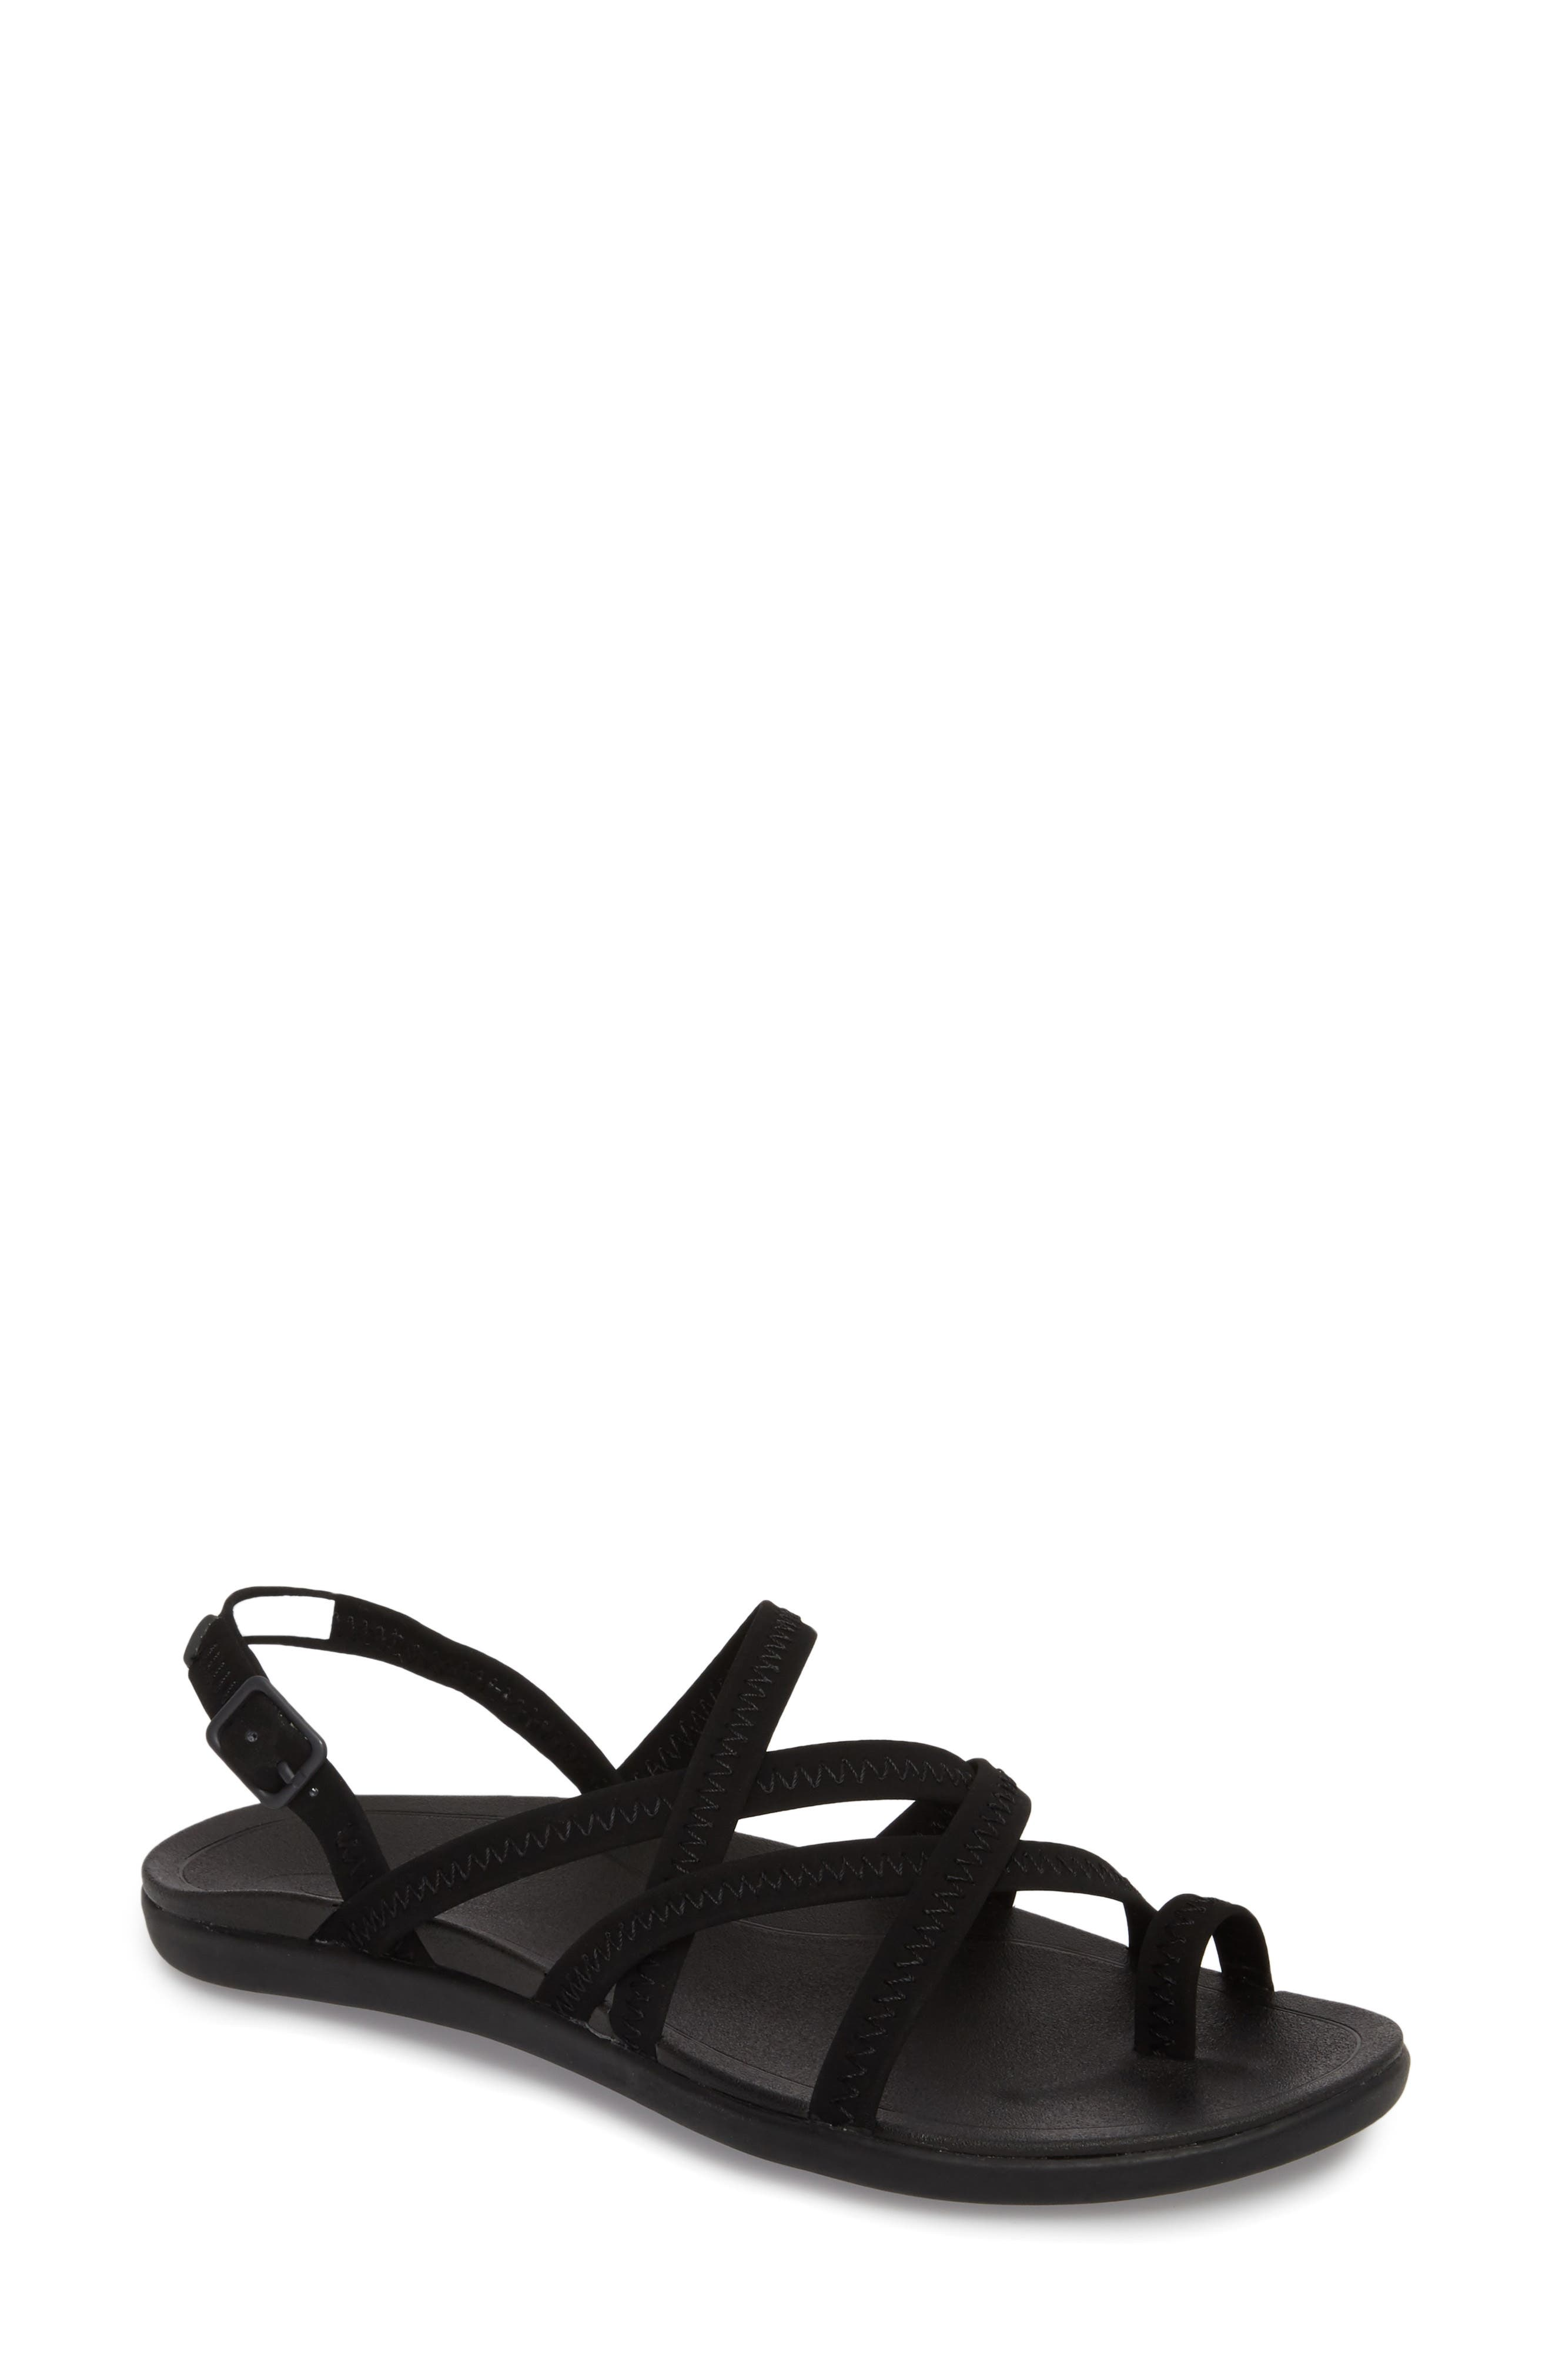 Kalapu Sandal,                         Main,                         color, BLACK/ BLACK FAUX LEATHER